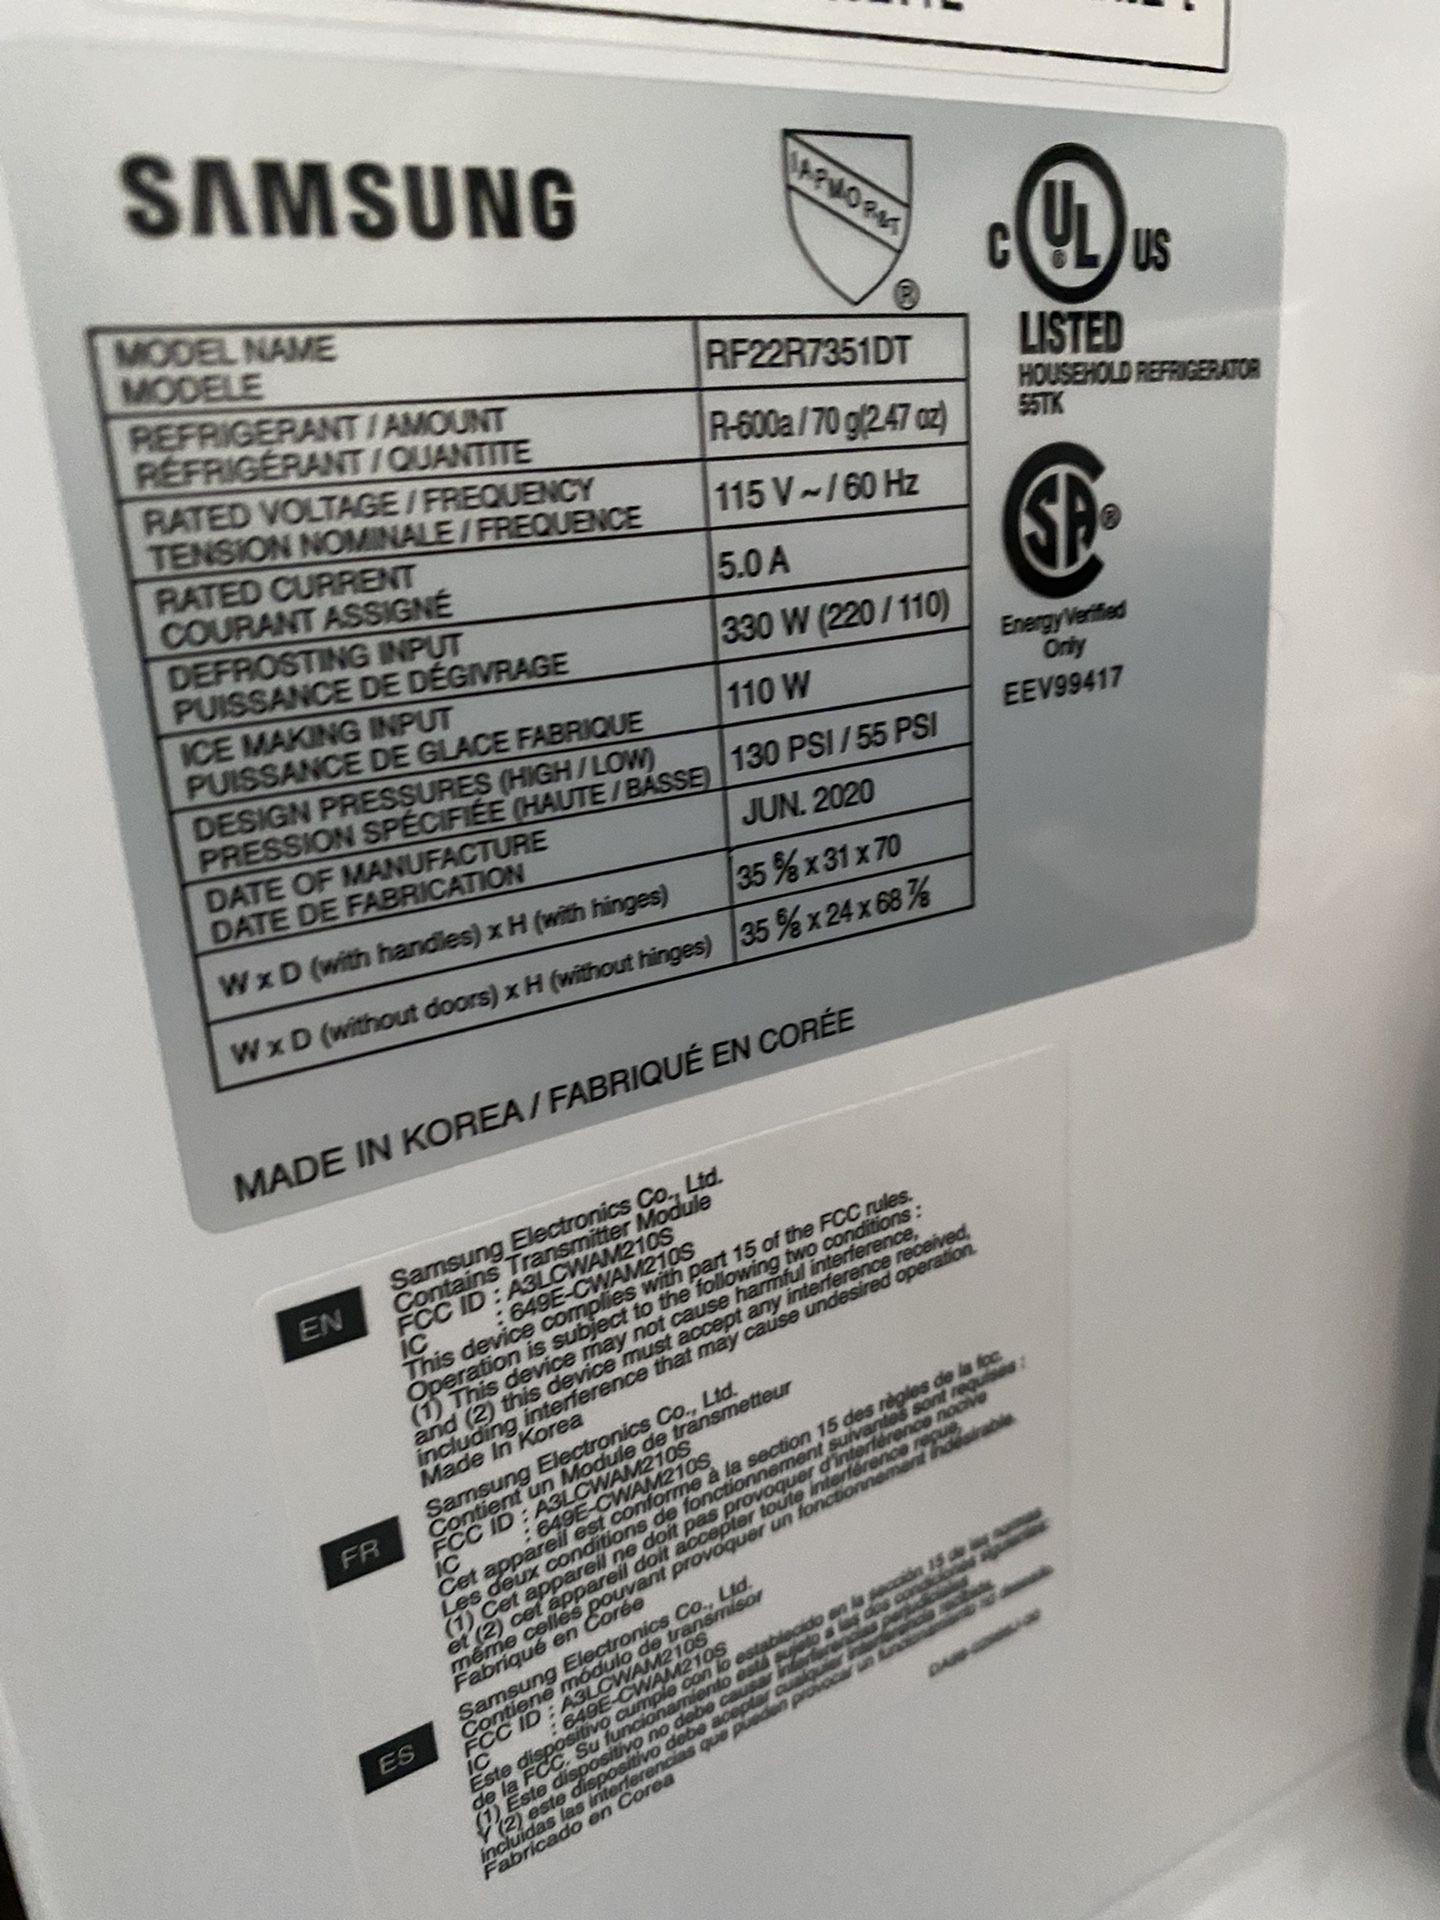 Samsung French Door Refrigerator Open Box